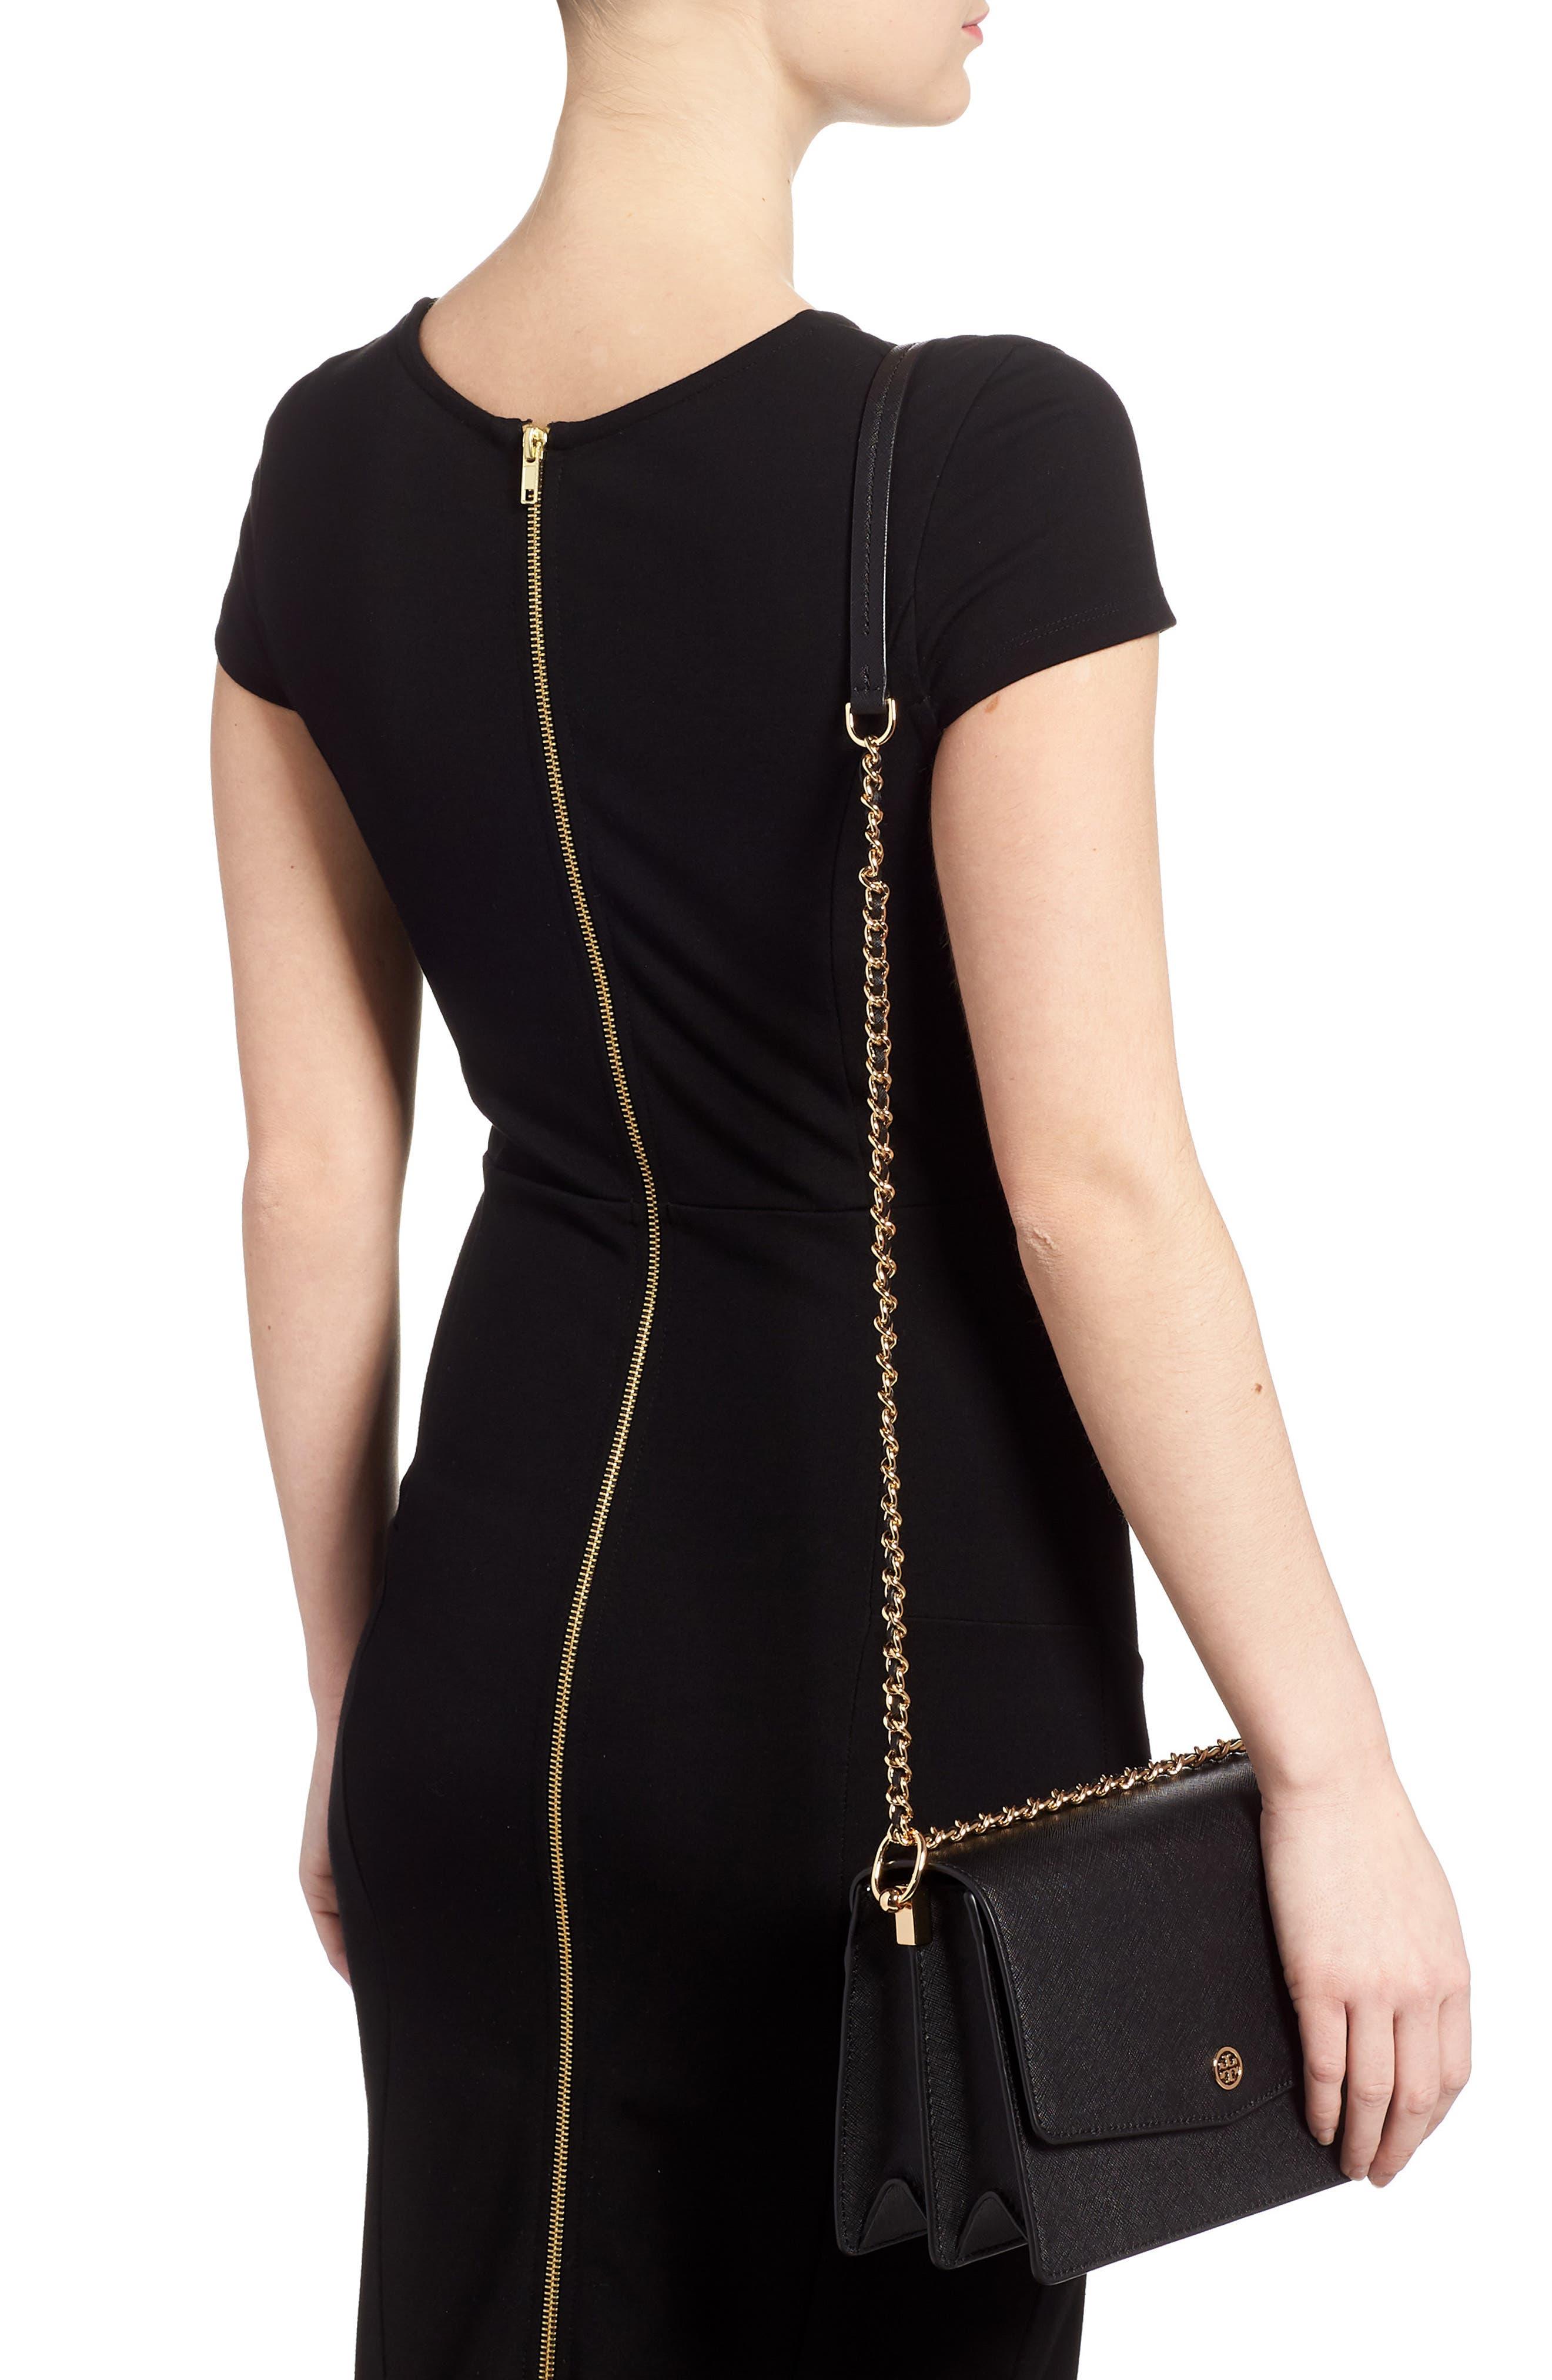 Robinson Convertible Leather Shoulder Bag,                             Alternate thumbnail 2, color,                             BLACK / ROYAL NAVY